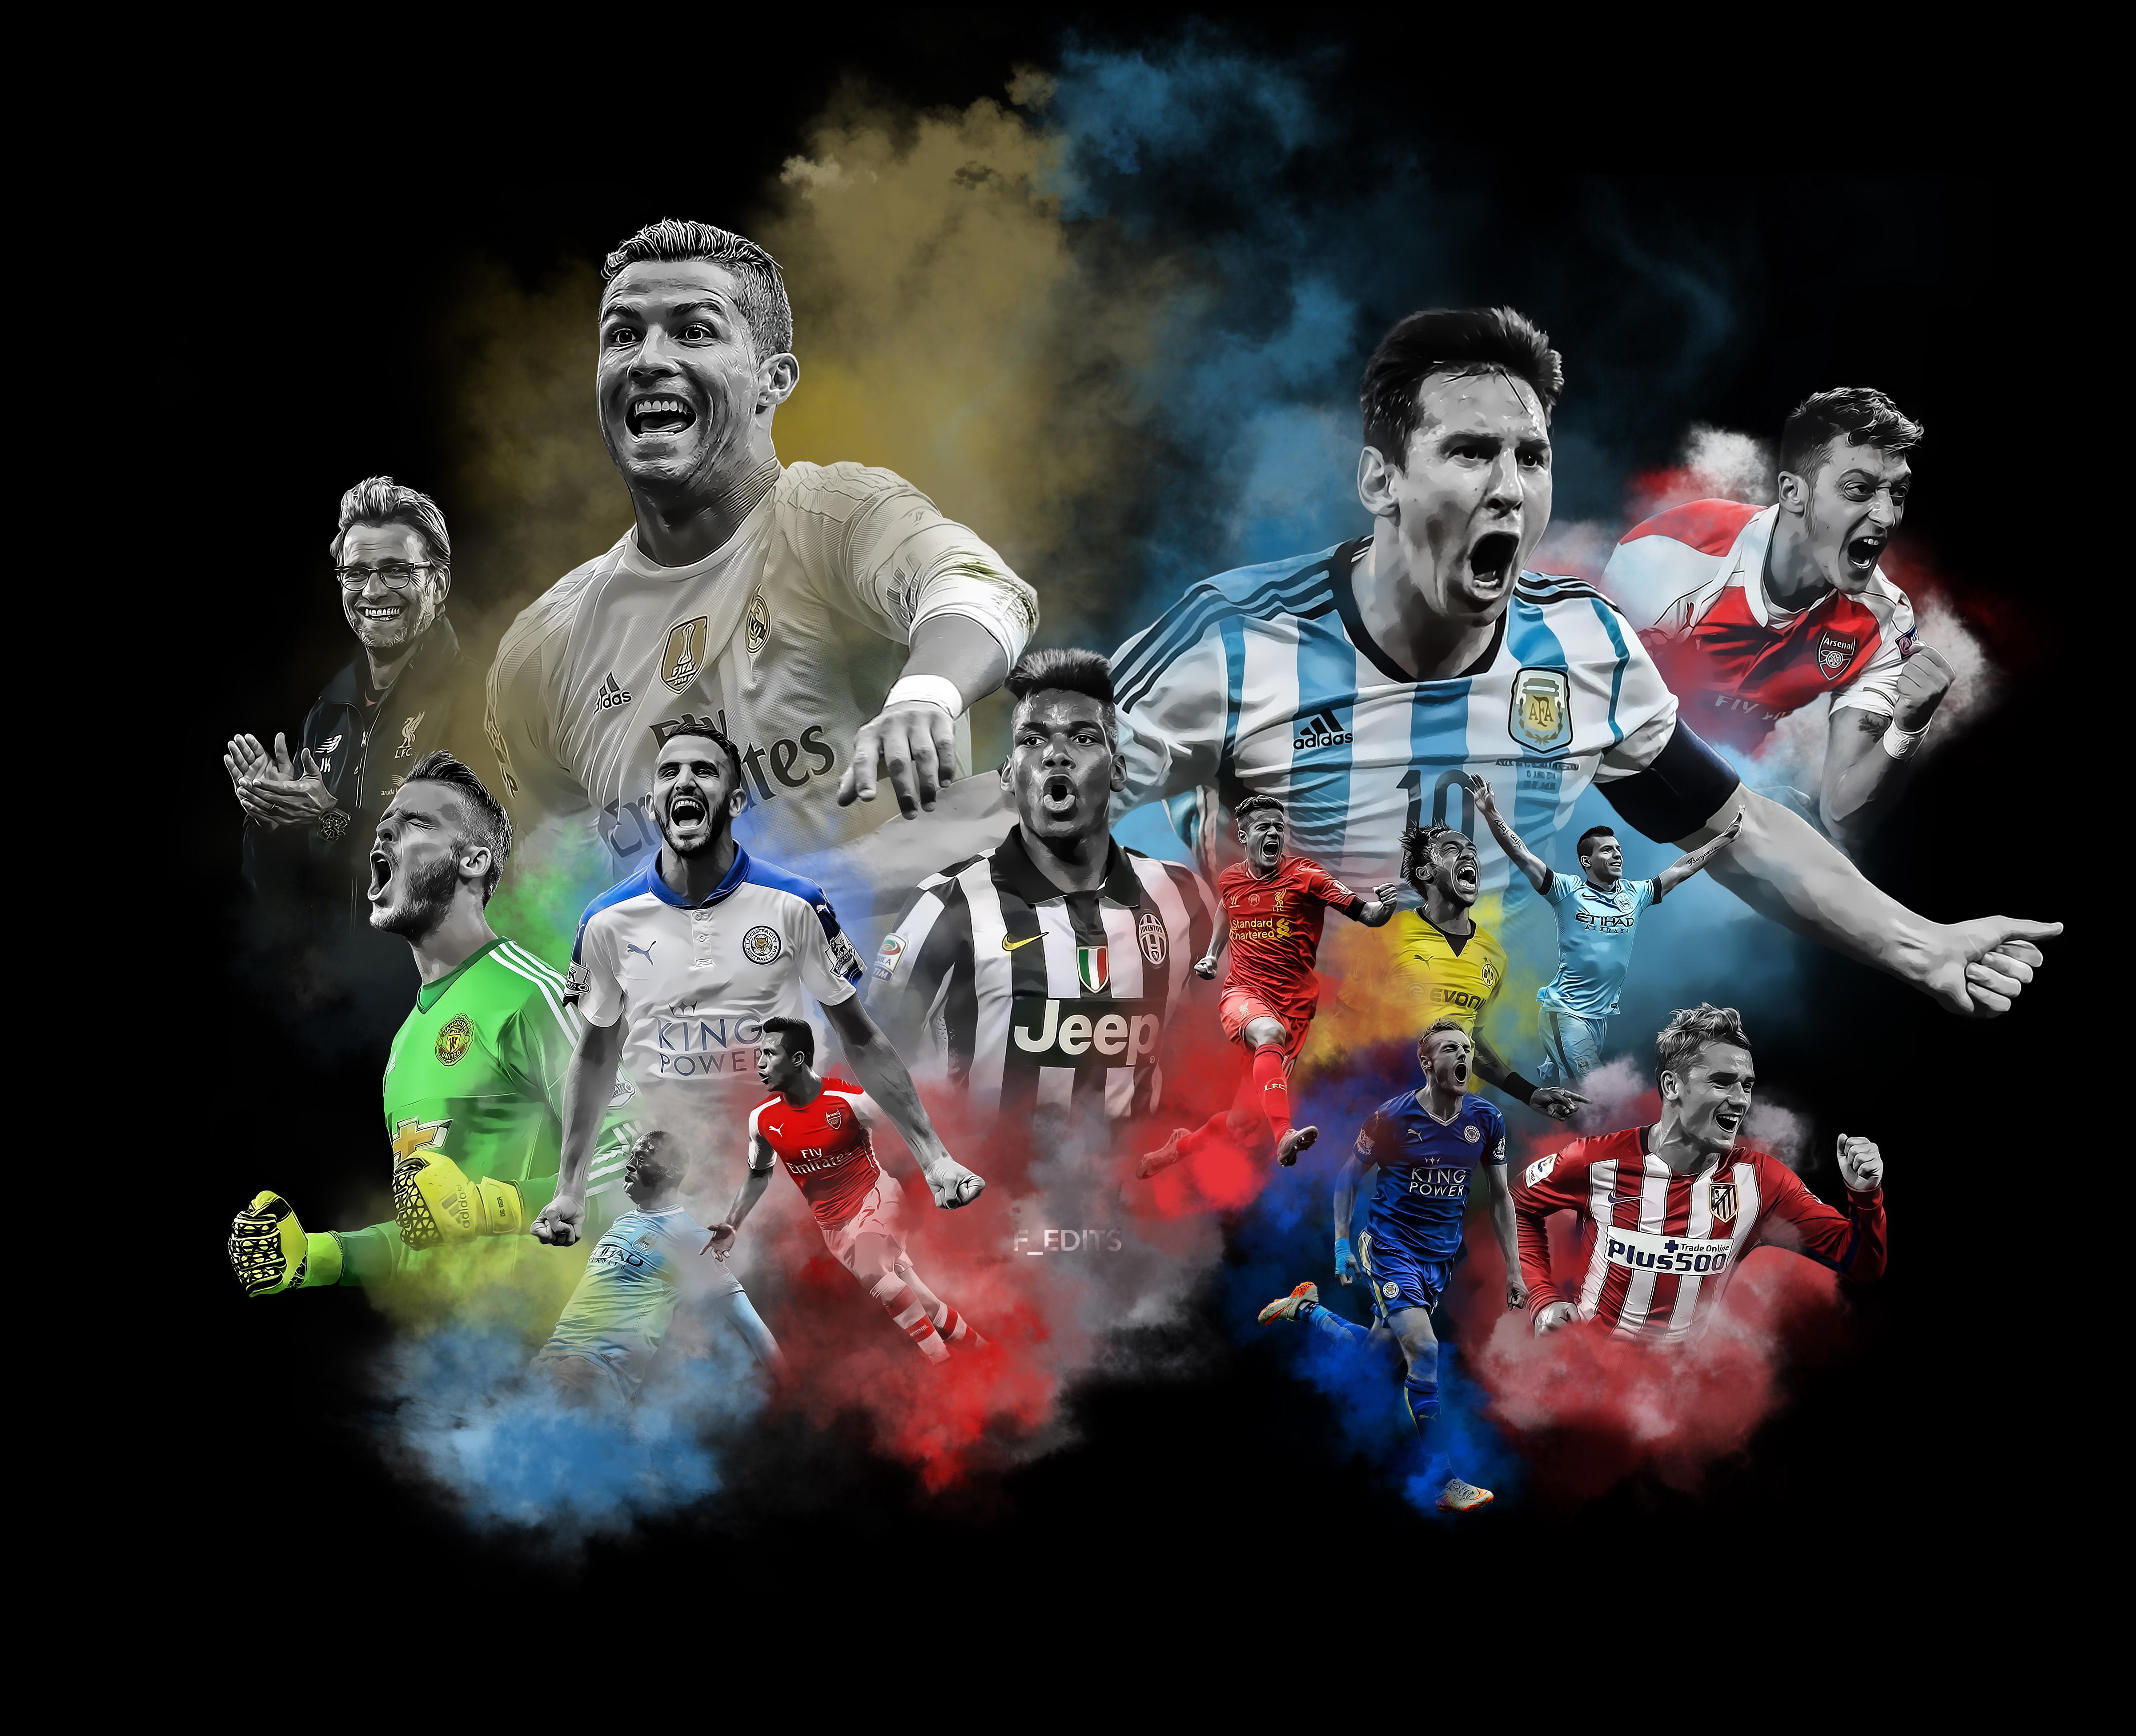 Football Pc Wallpaper: Beautiful Football Desktop Wallpaper By F-EDITS On DeviantArt